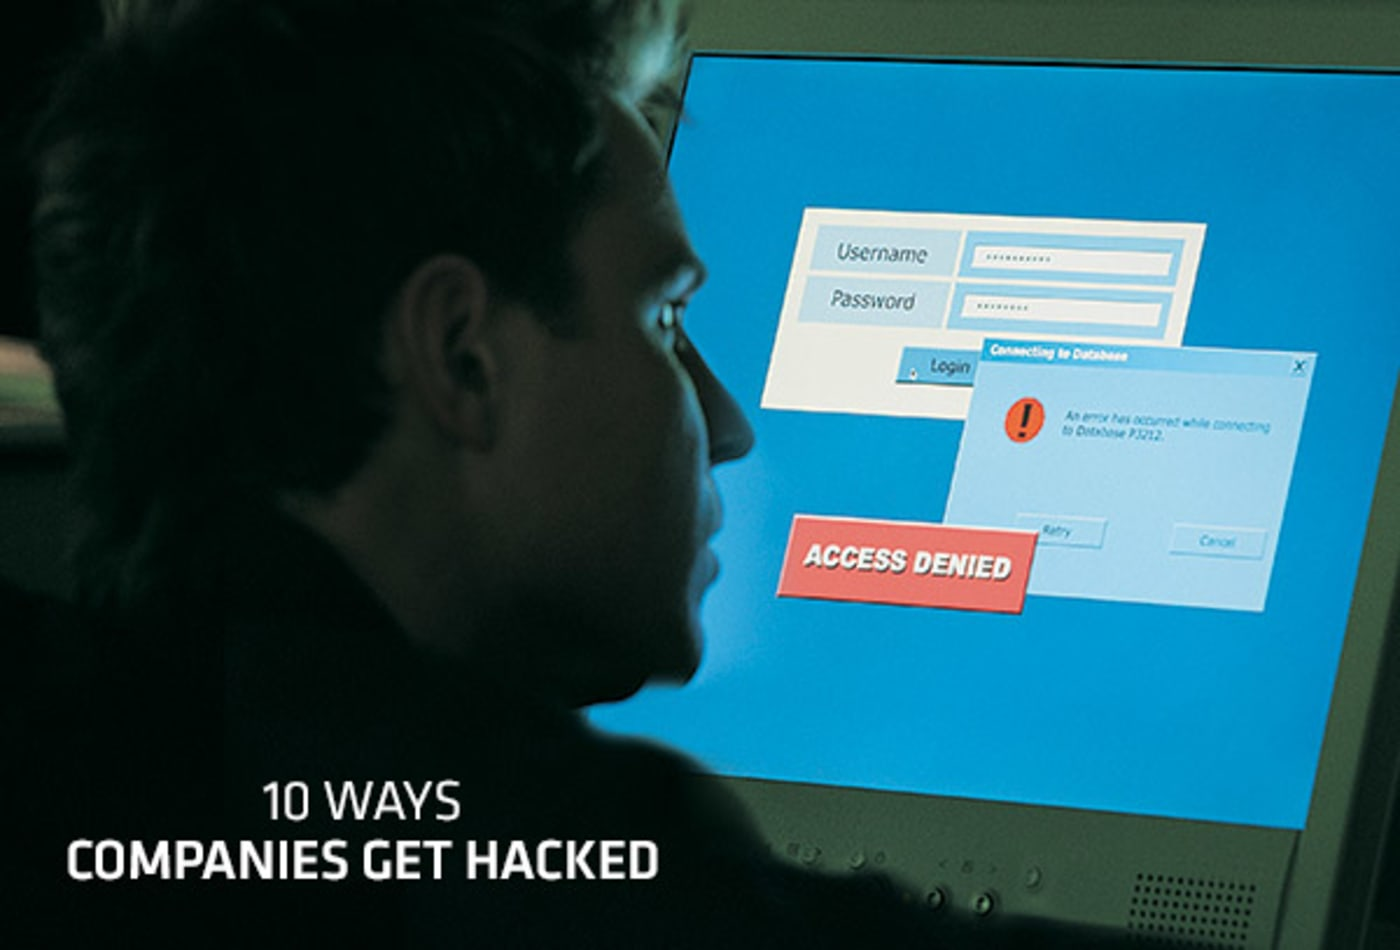 10 Ways Companies Get Hacked